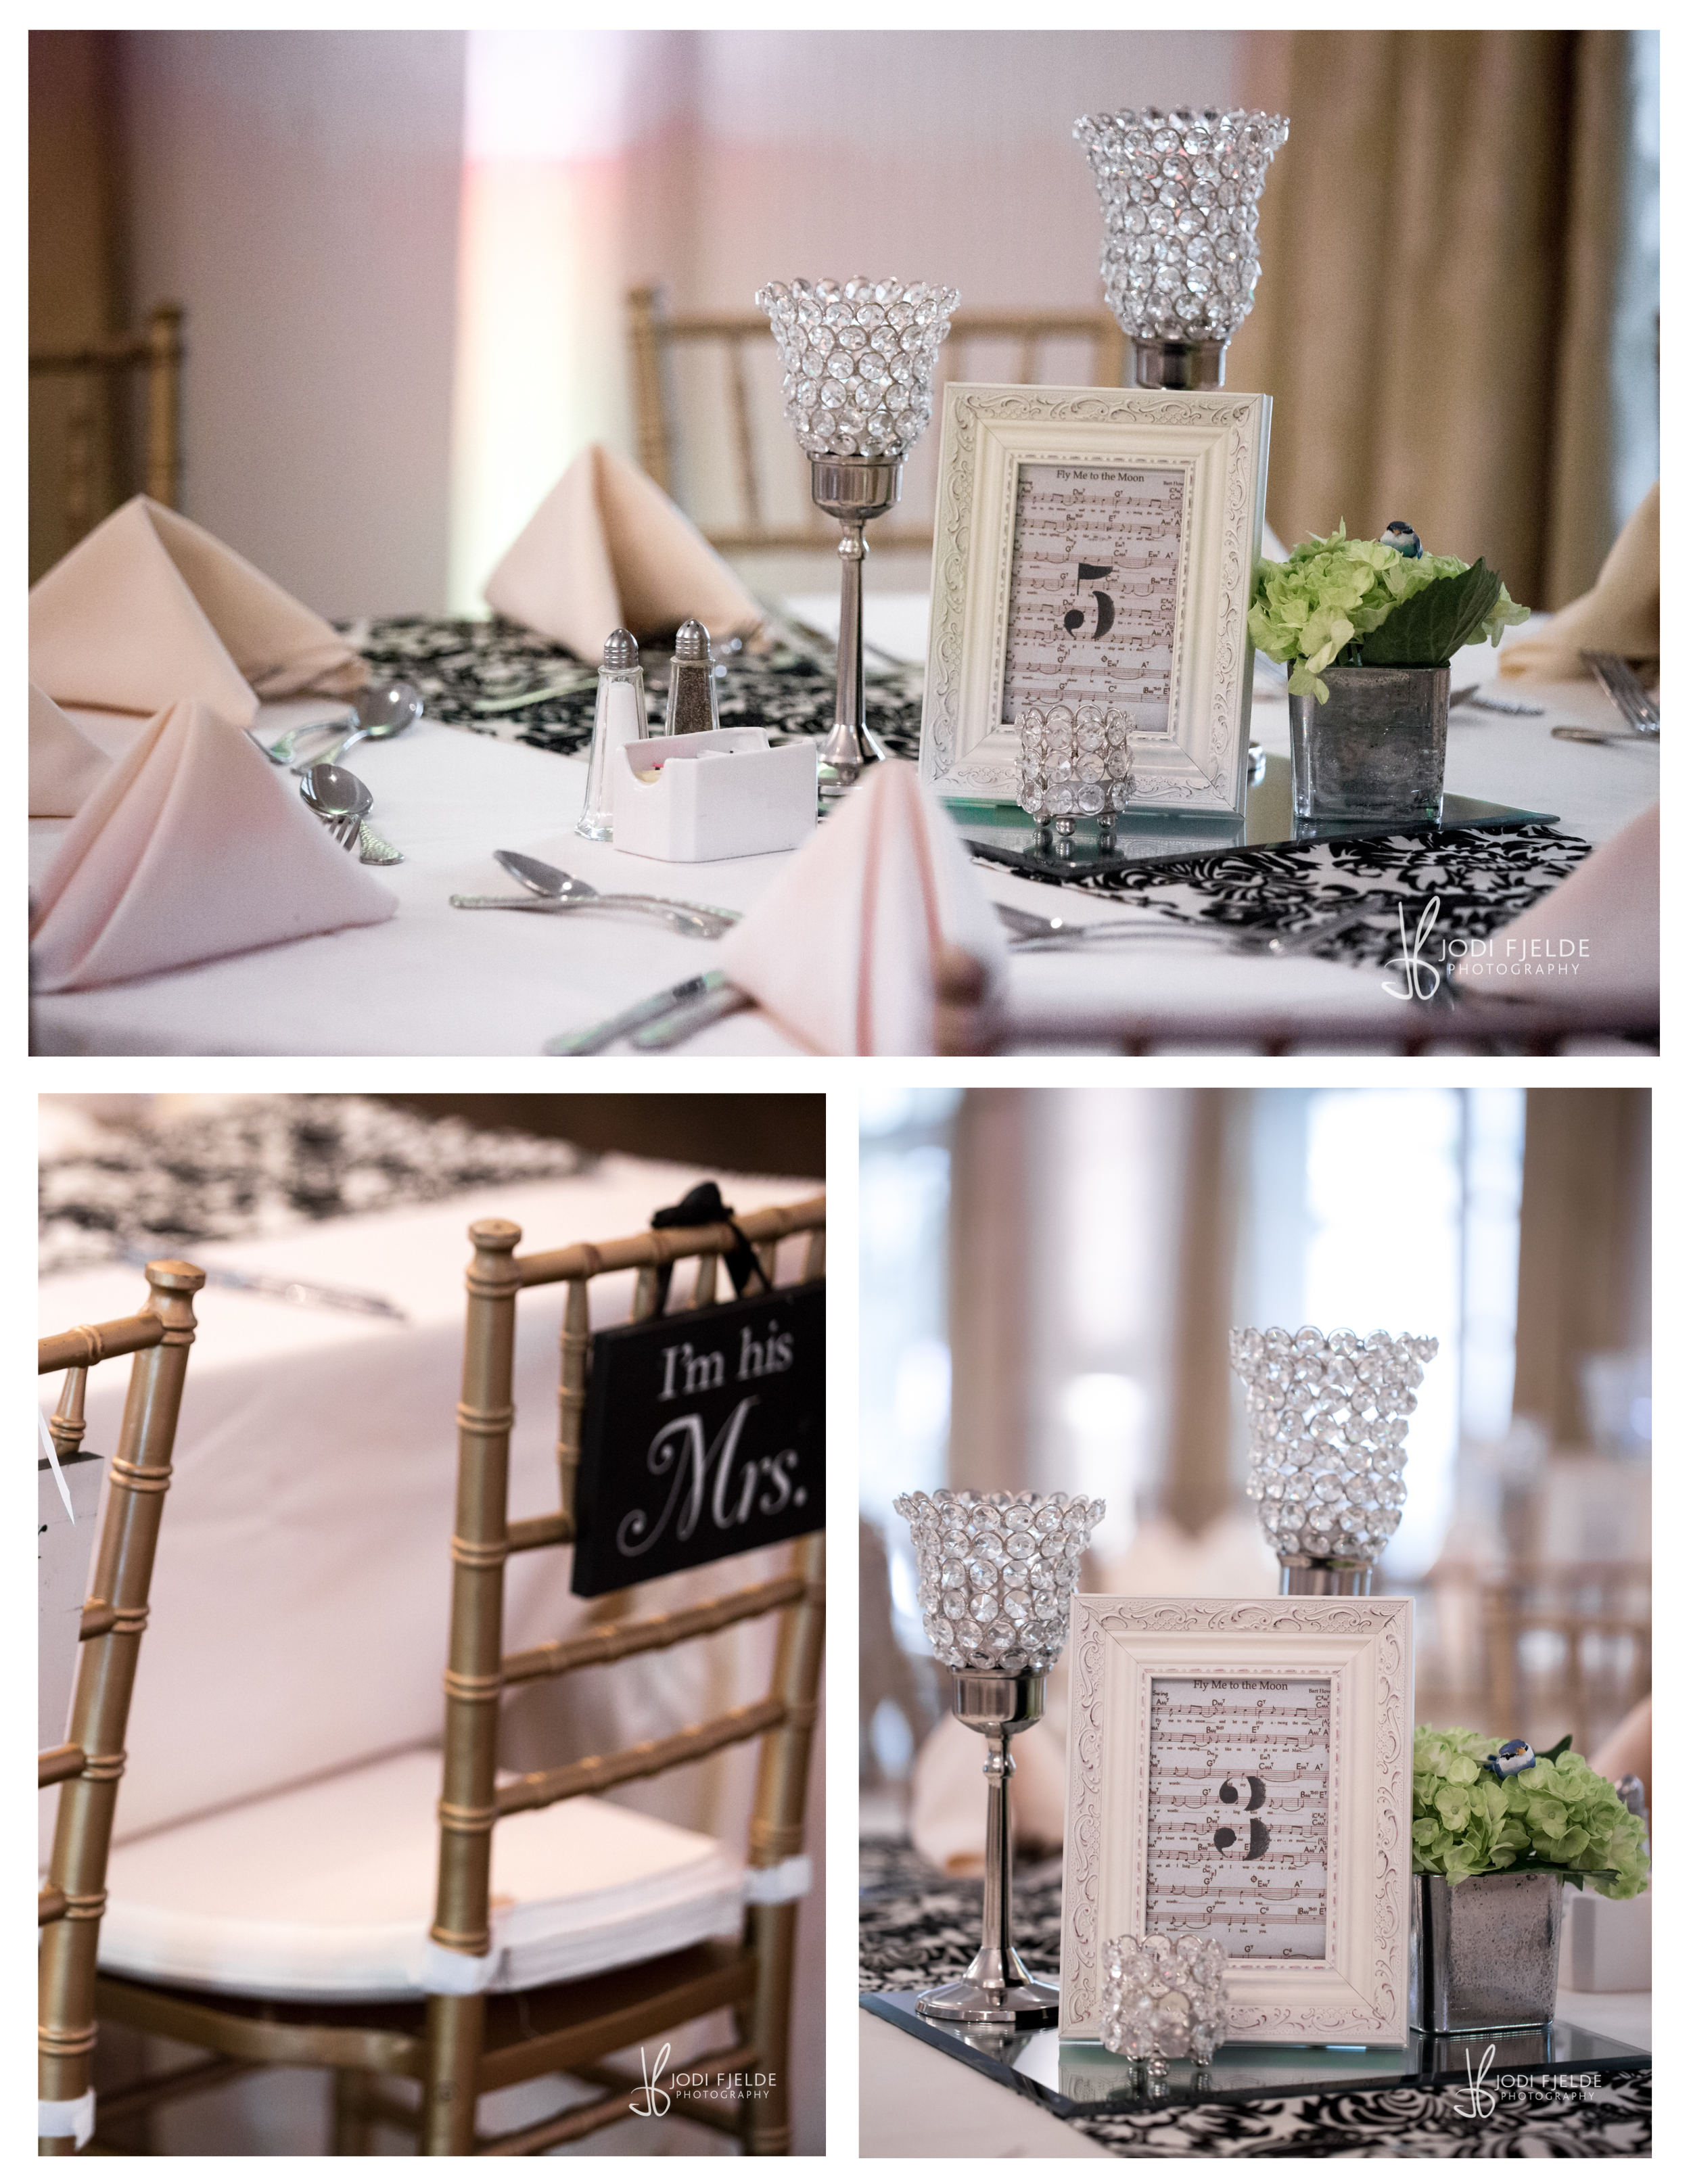 Highland_Manor_Apopka_Florida_wedding_Jackie_&_Tim_photography_jodi_Fjelde_photography-24.jpg